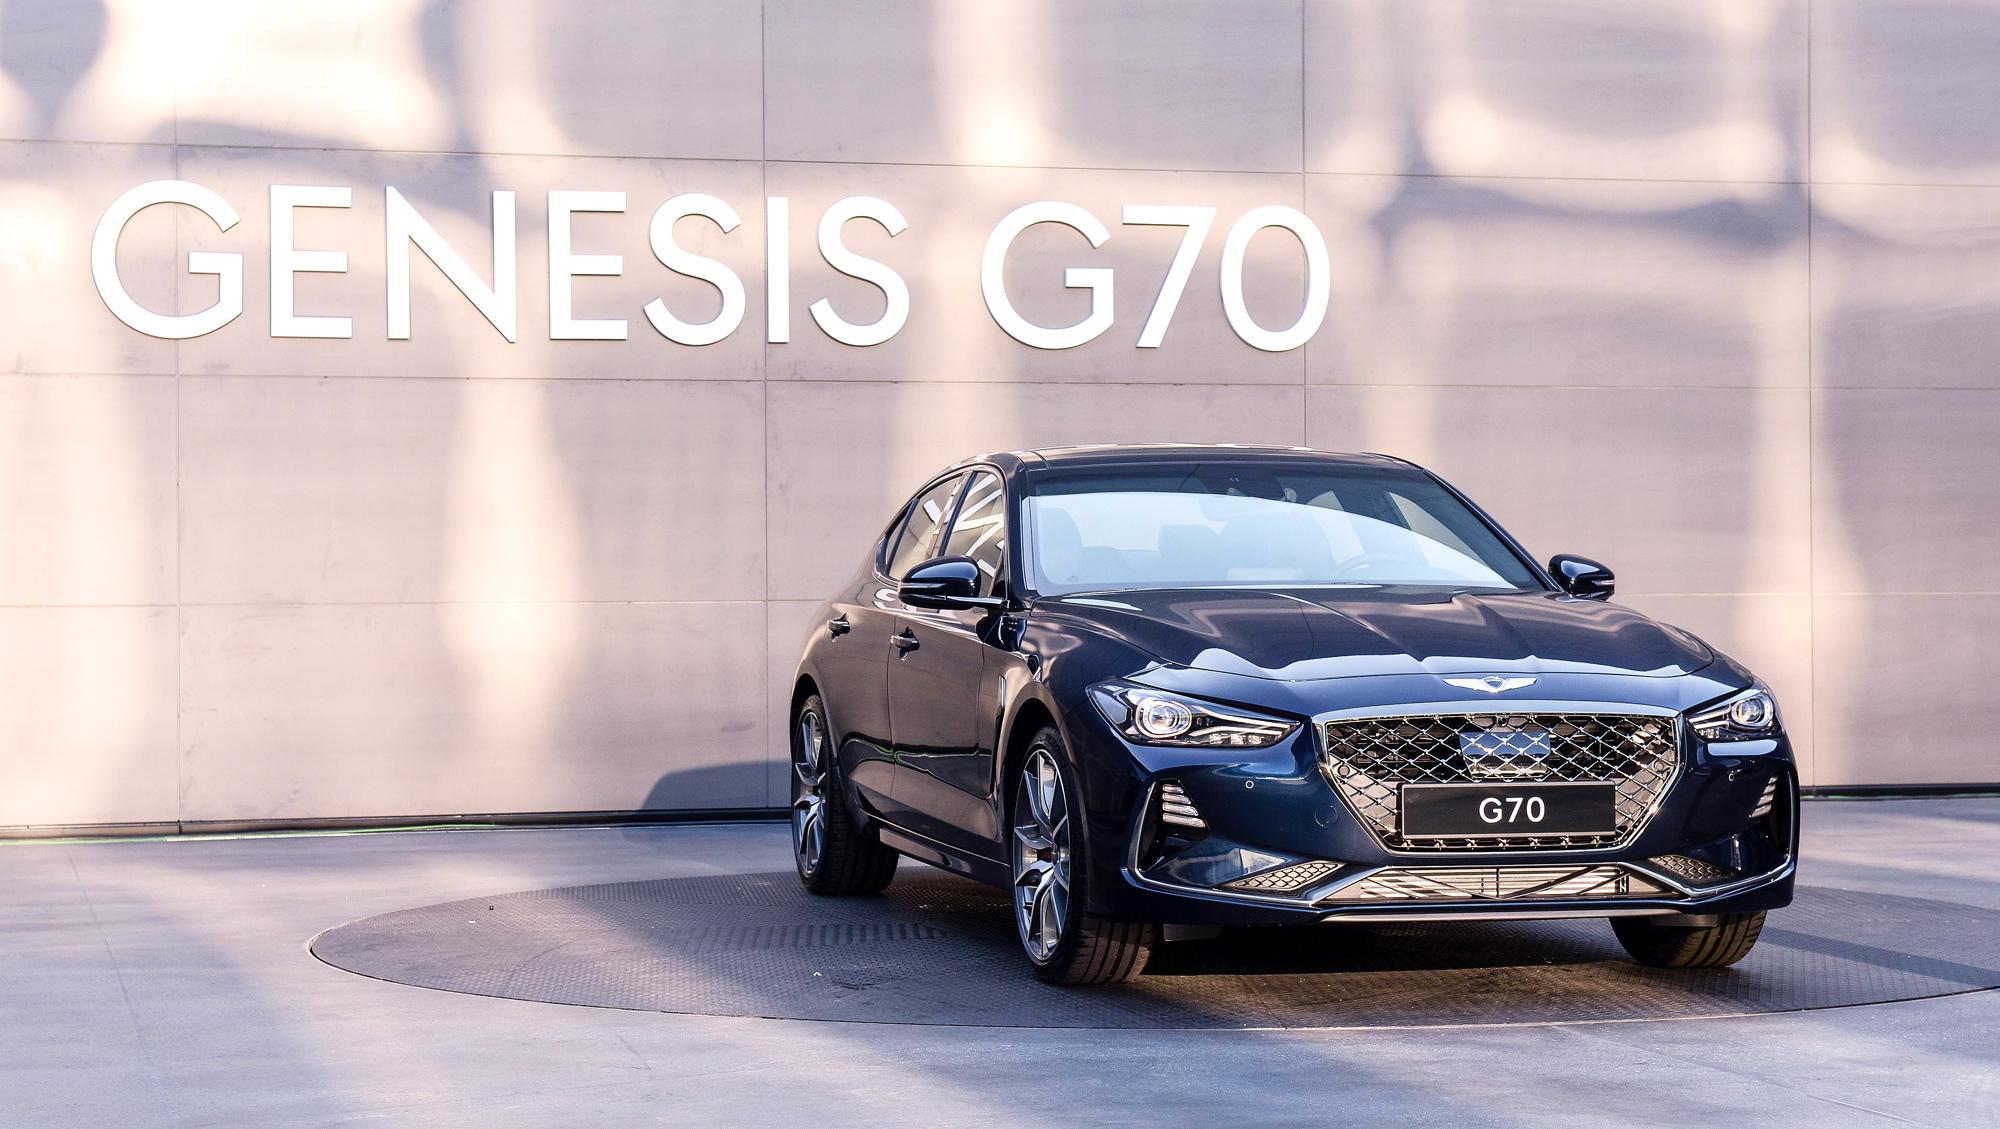 Genesis G70 Pictures